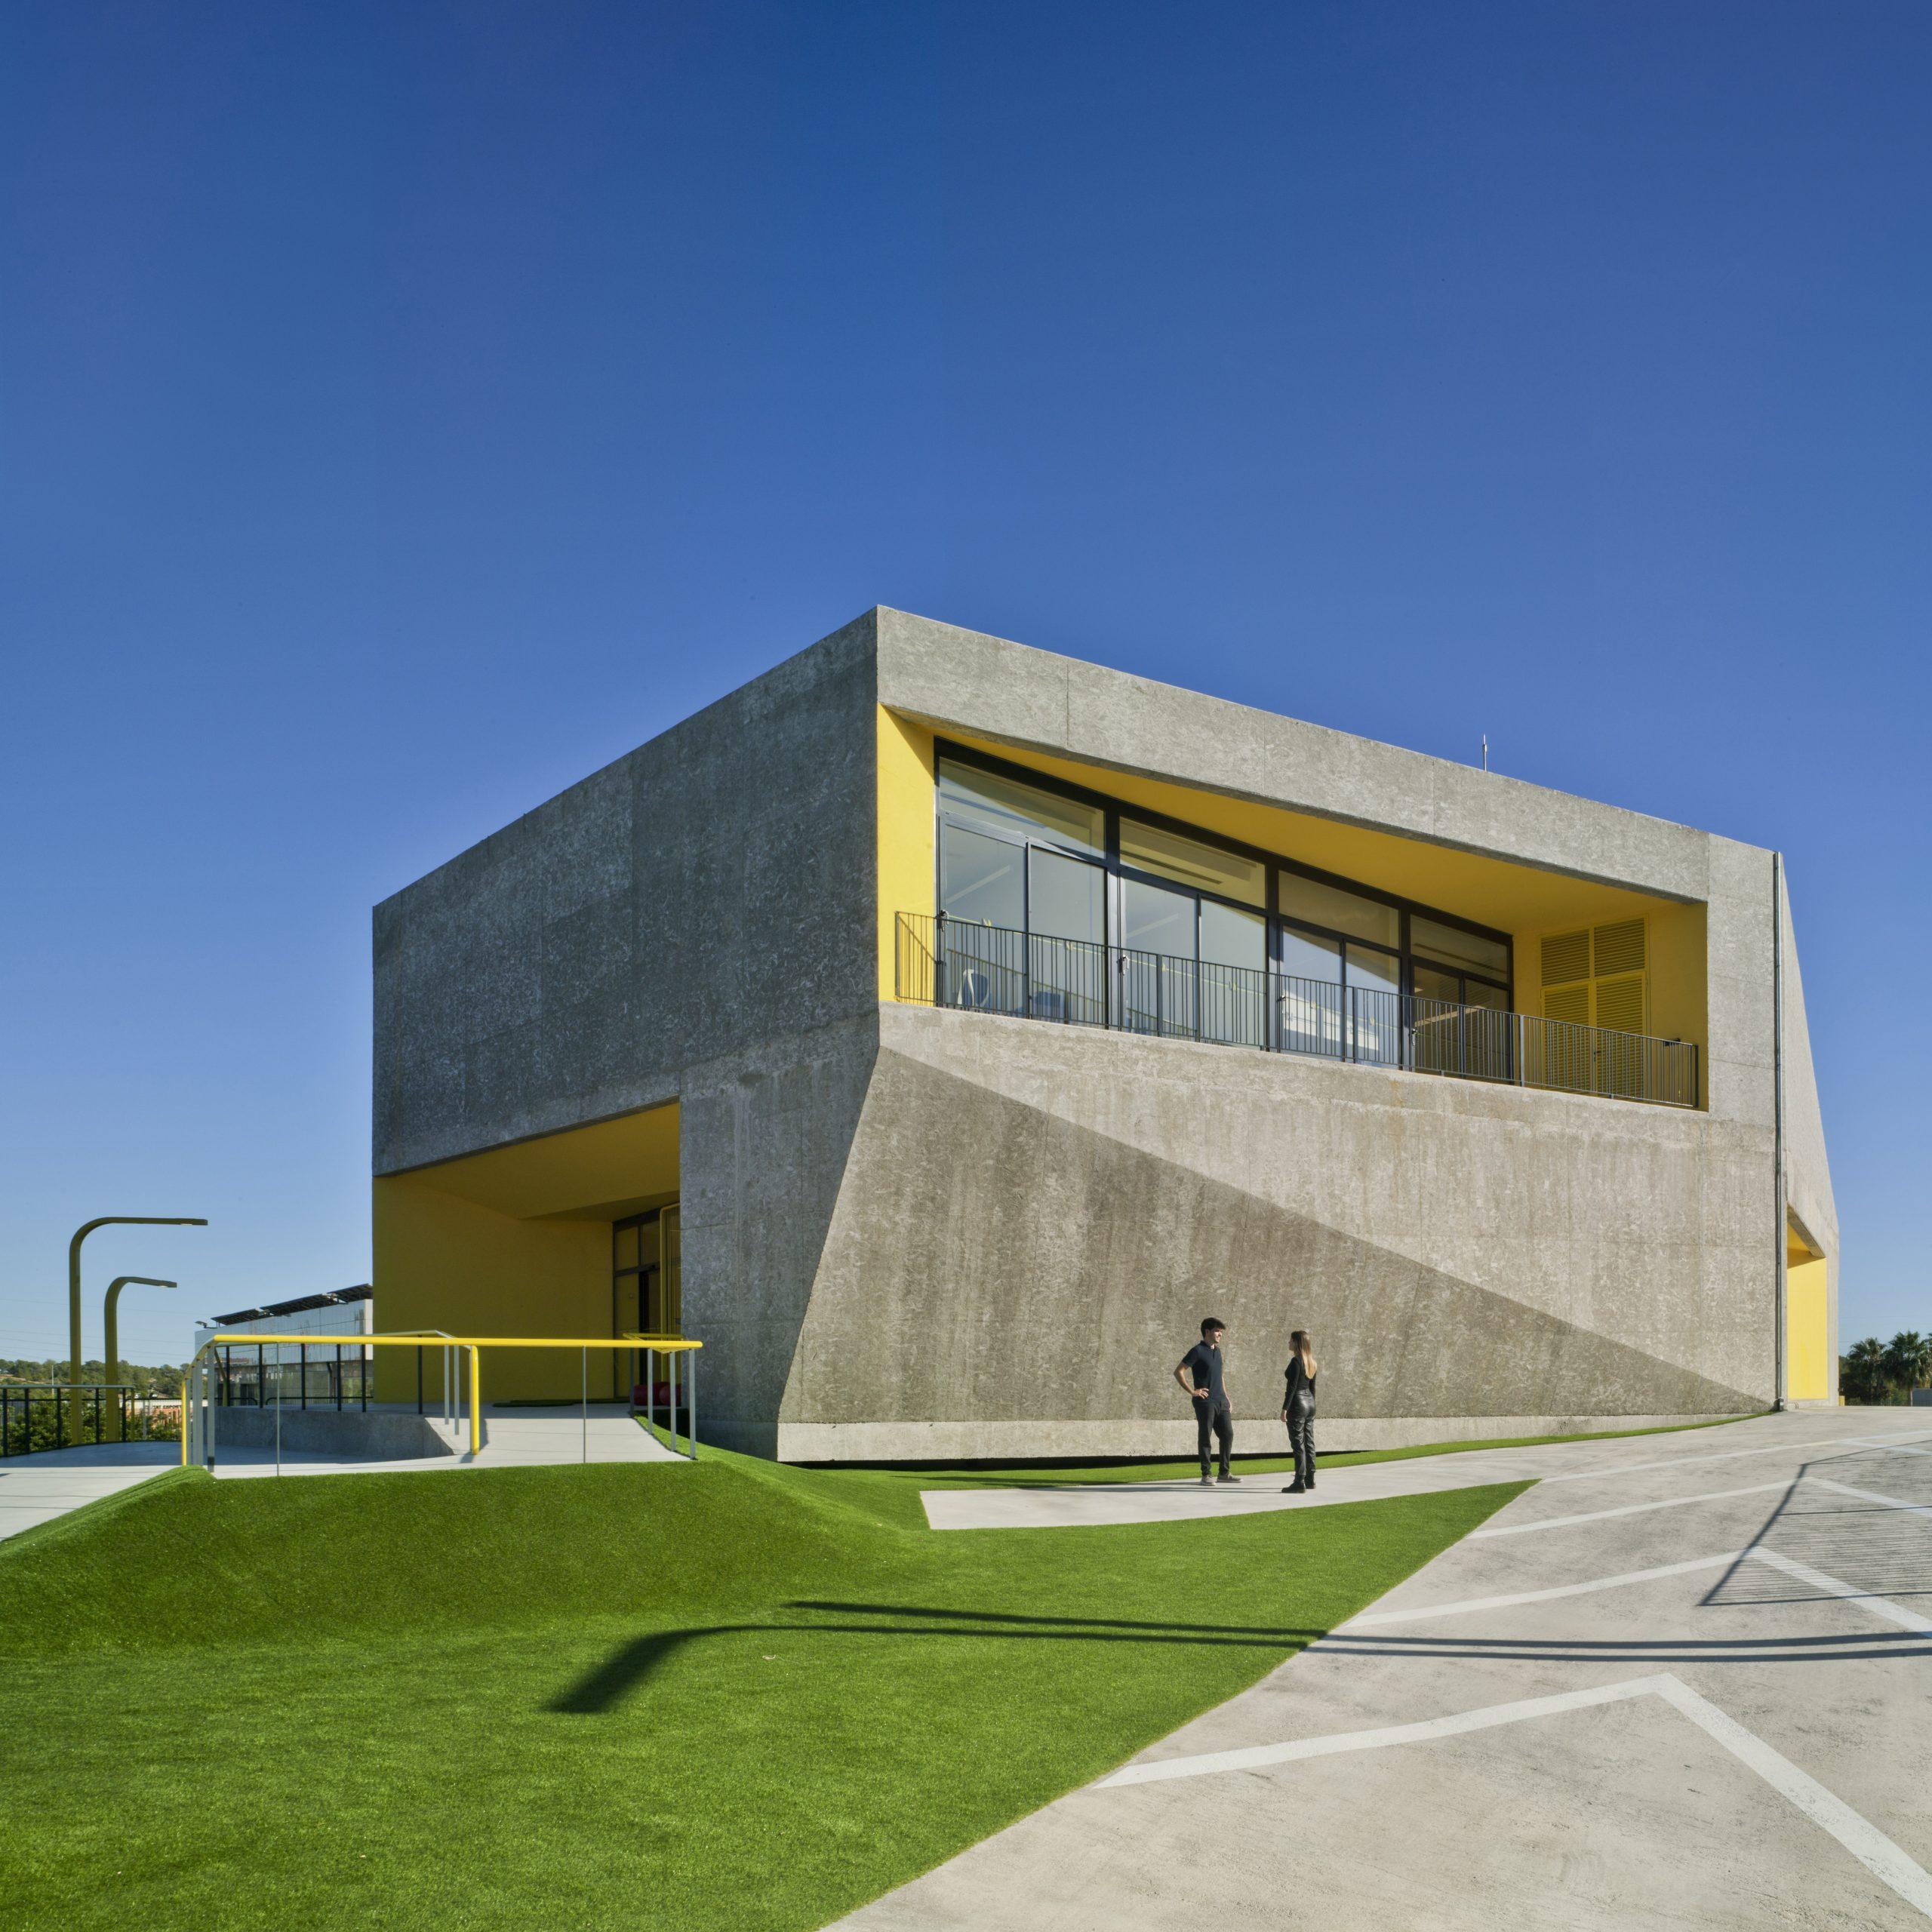 Arquitectura Dinamizante: la arquitectura como dinamizador económico